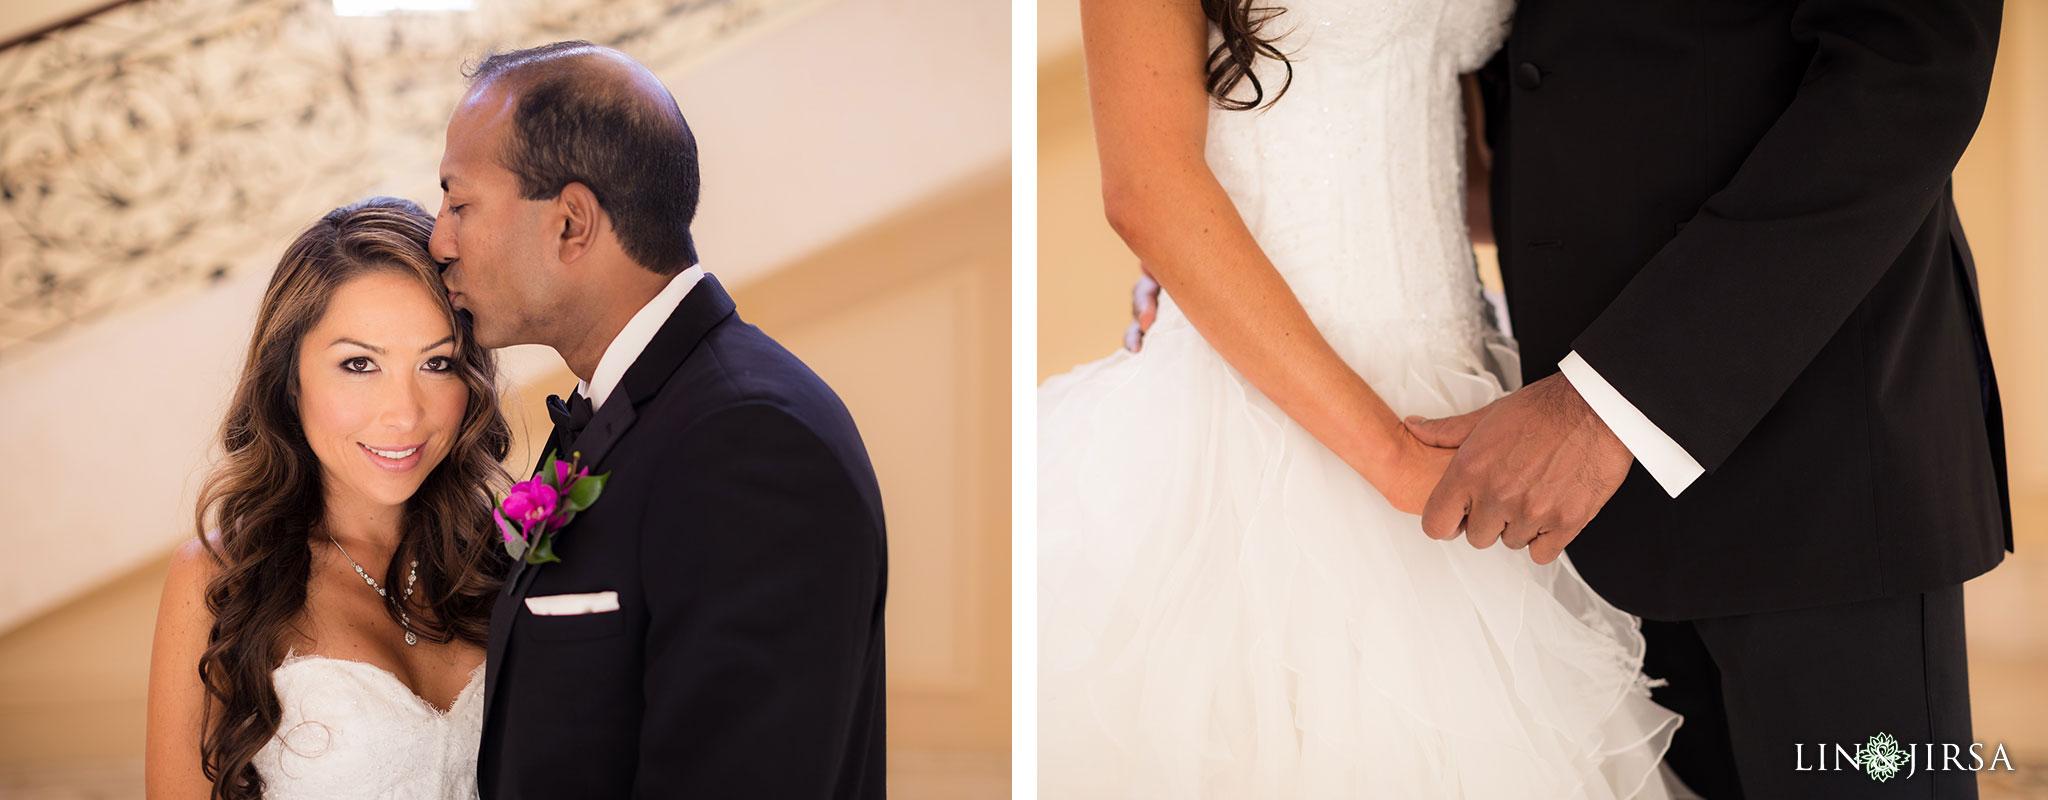 13 monarch beach resort wedding photography